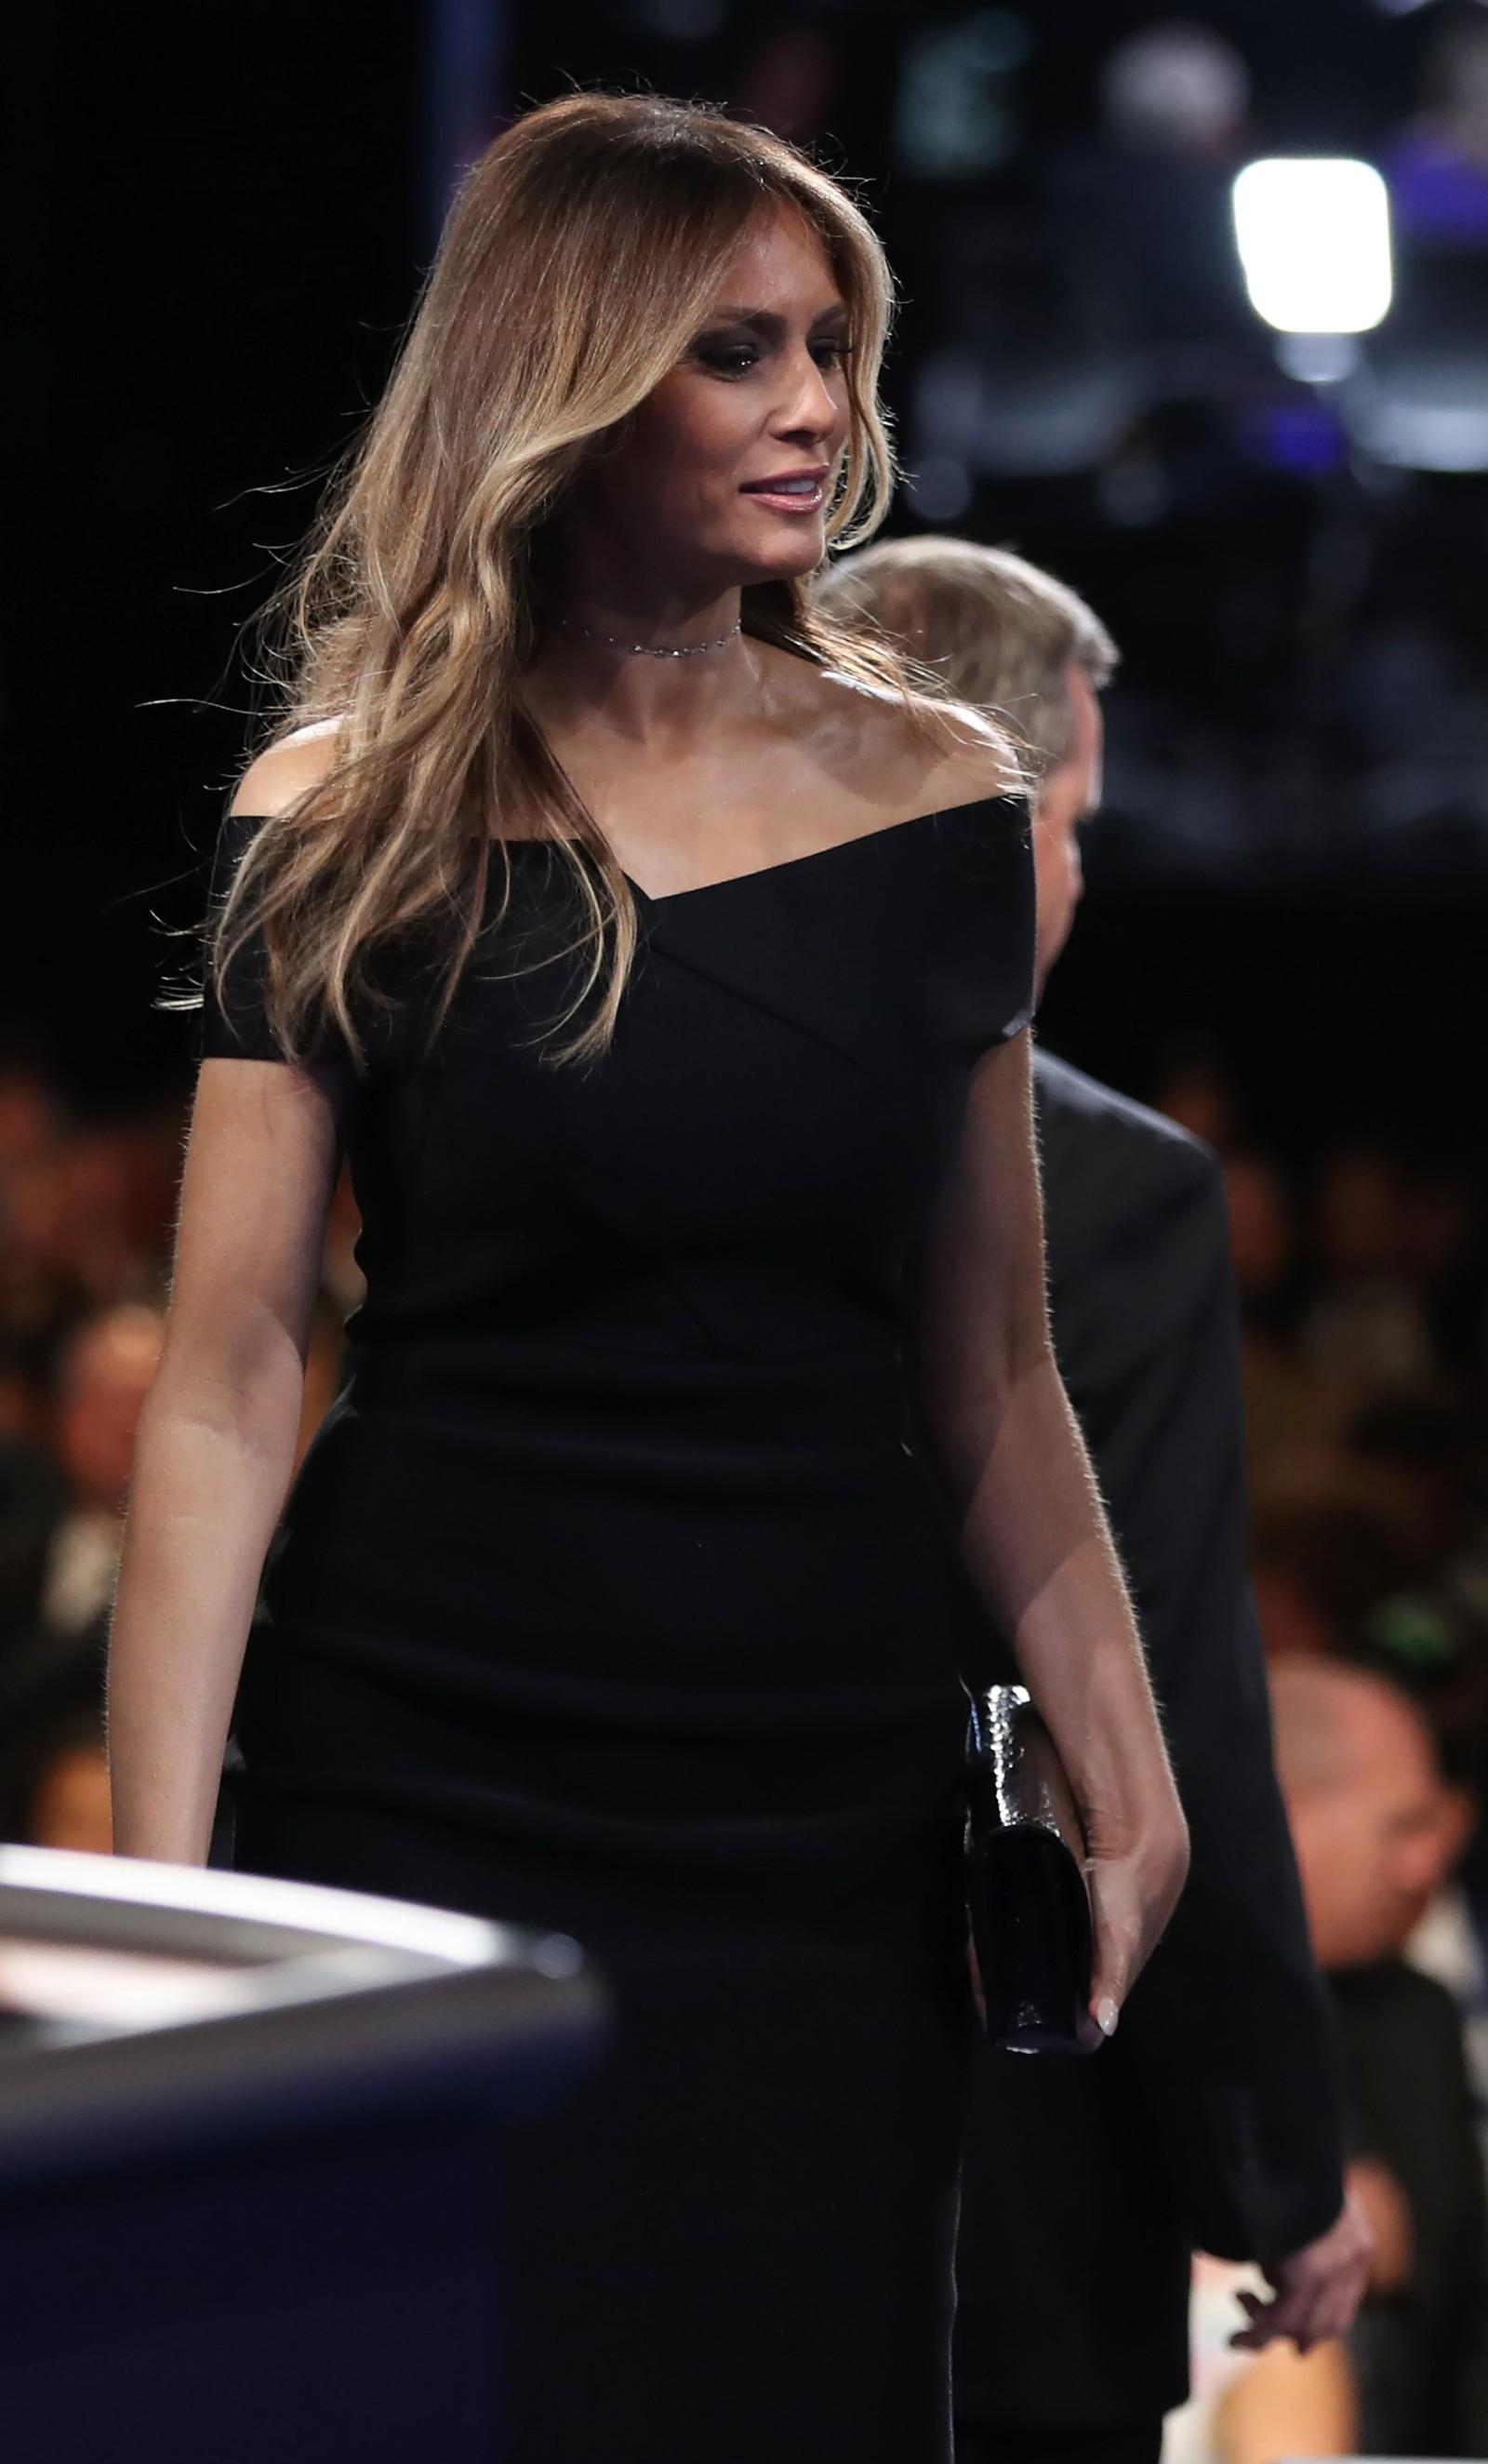 Melania Trump, Donald Trumps kone, entret scenen etter debatten.